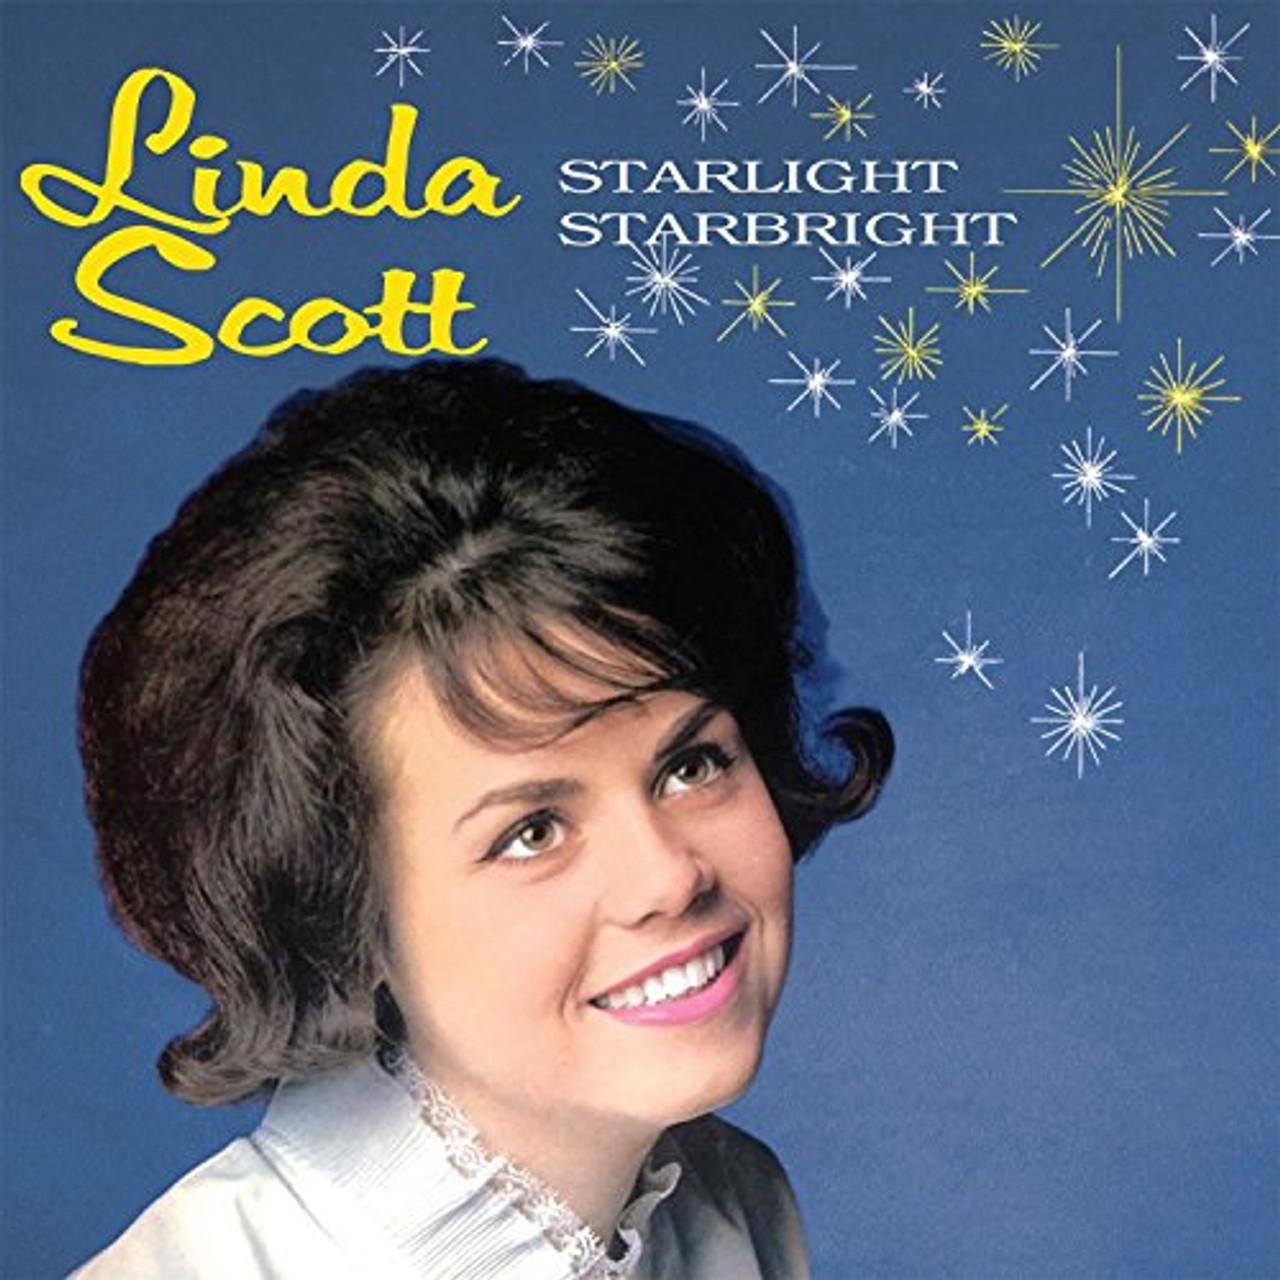 Linda Scott Starlight, Starbright